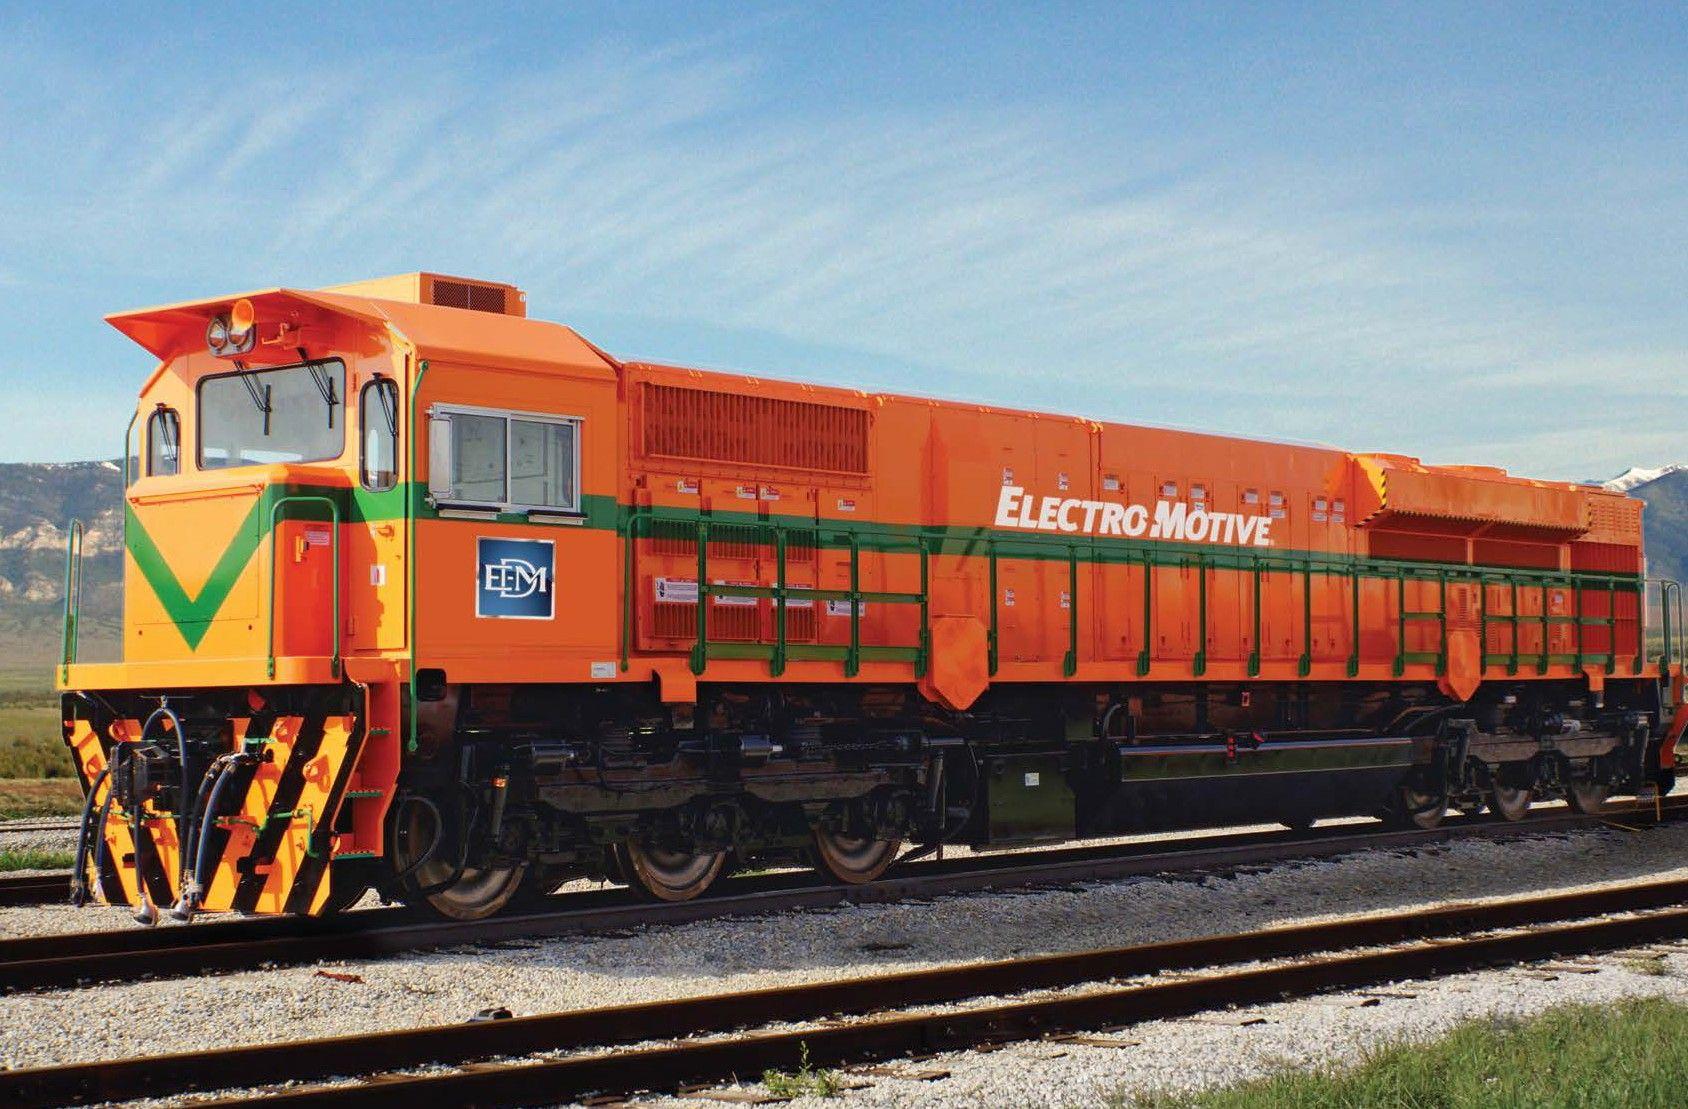 GT46AC Asia EMD Locomotive